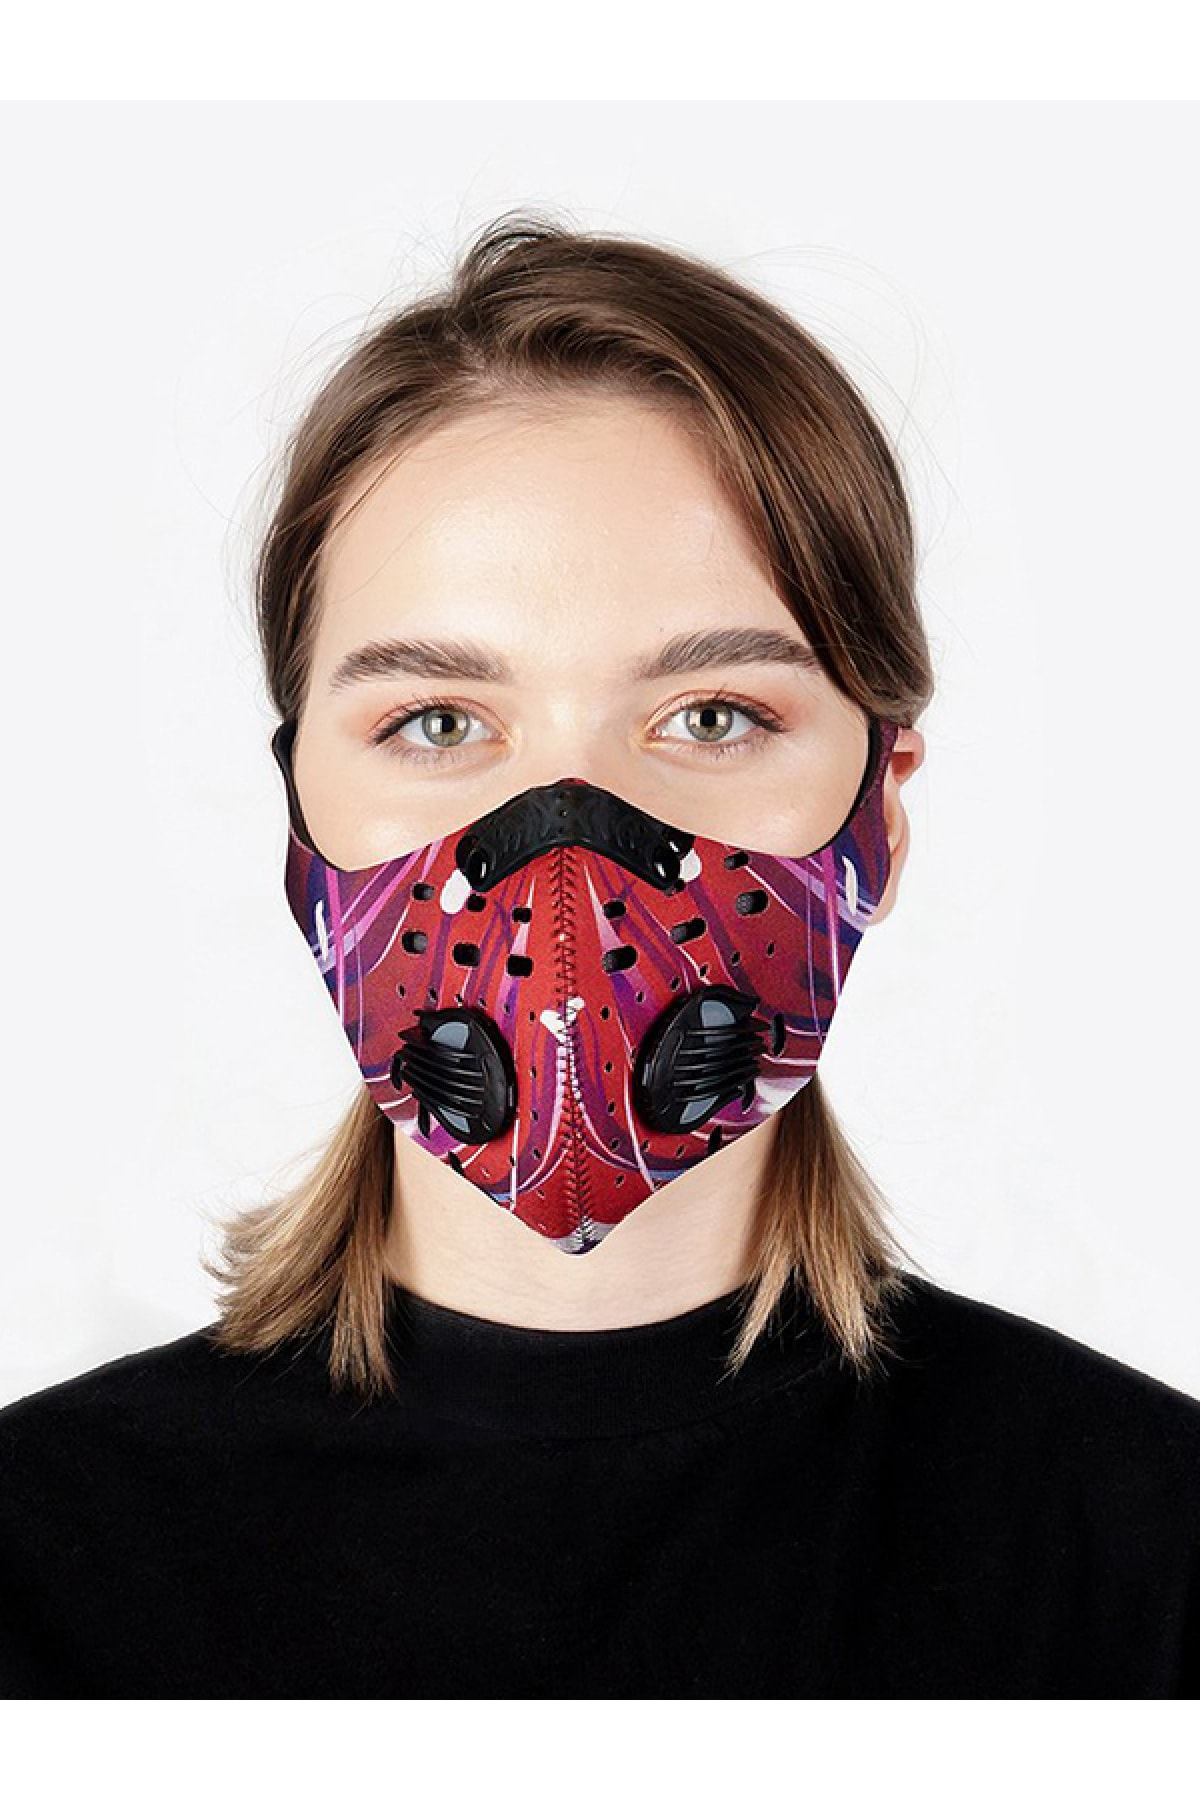 CHUM Kadın Lightspeed Aktif Karbon Filtreli Outdoor Maske 2